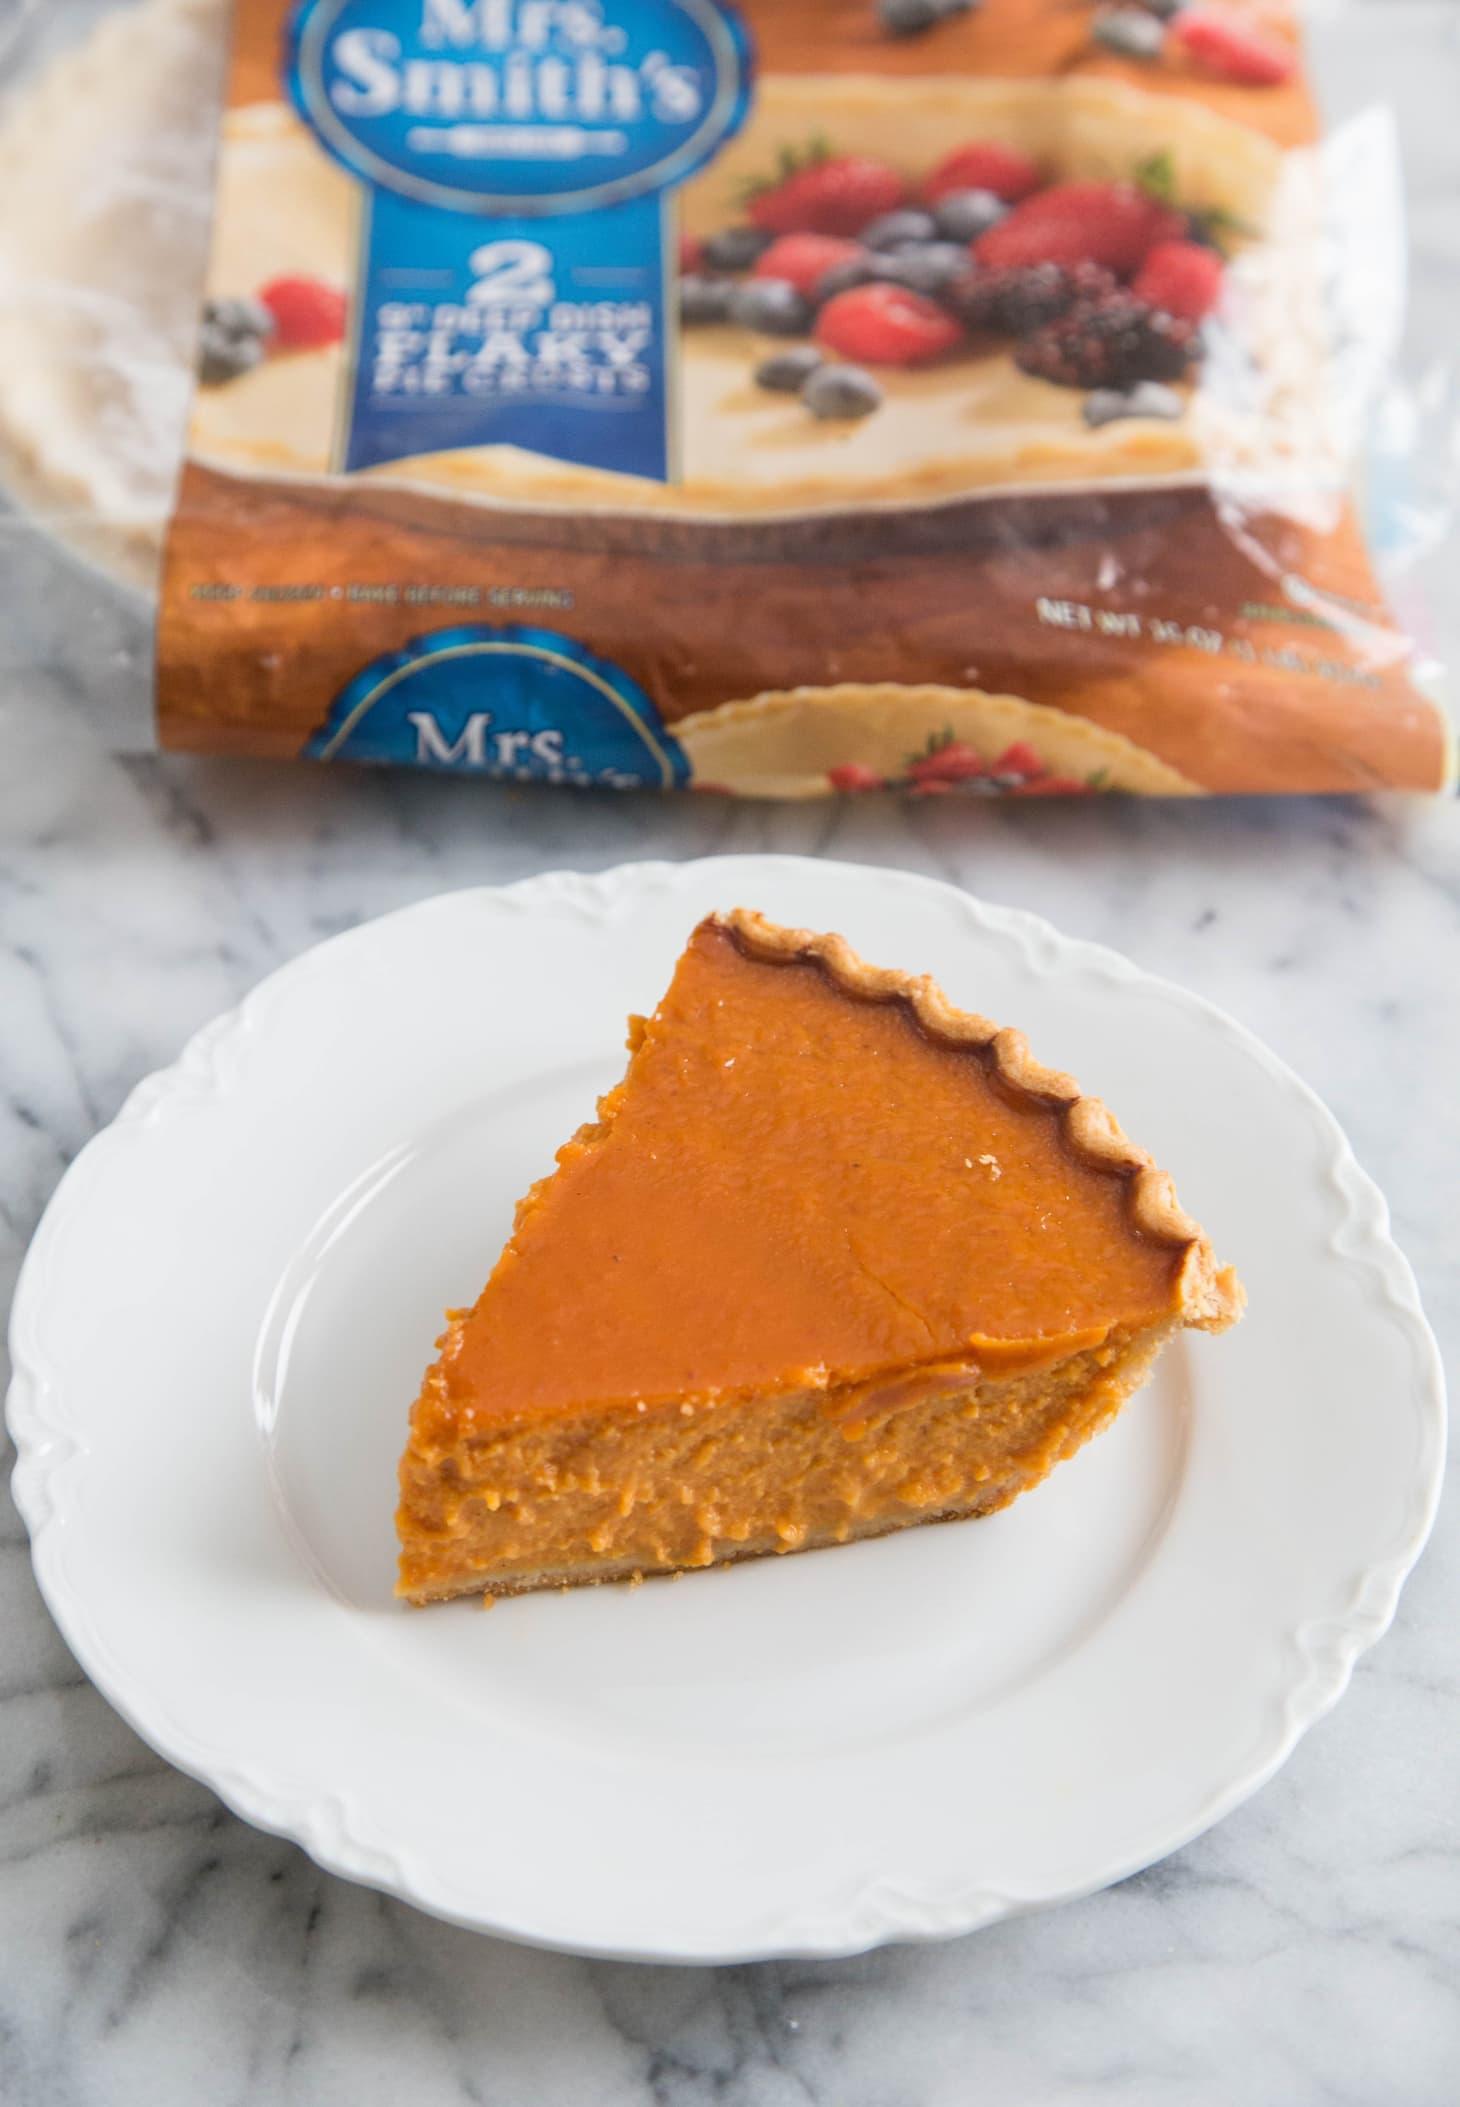 The Frozen Pie Crust Taste Test: We Tried 7 Brands and ...